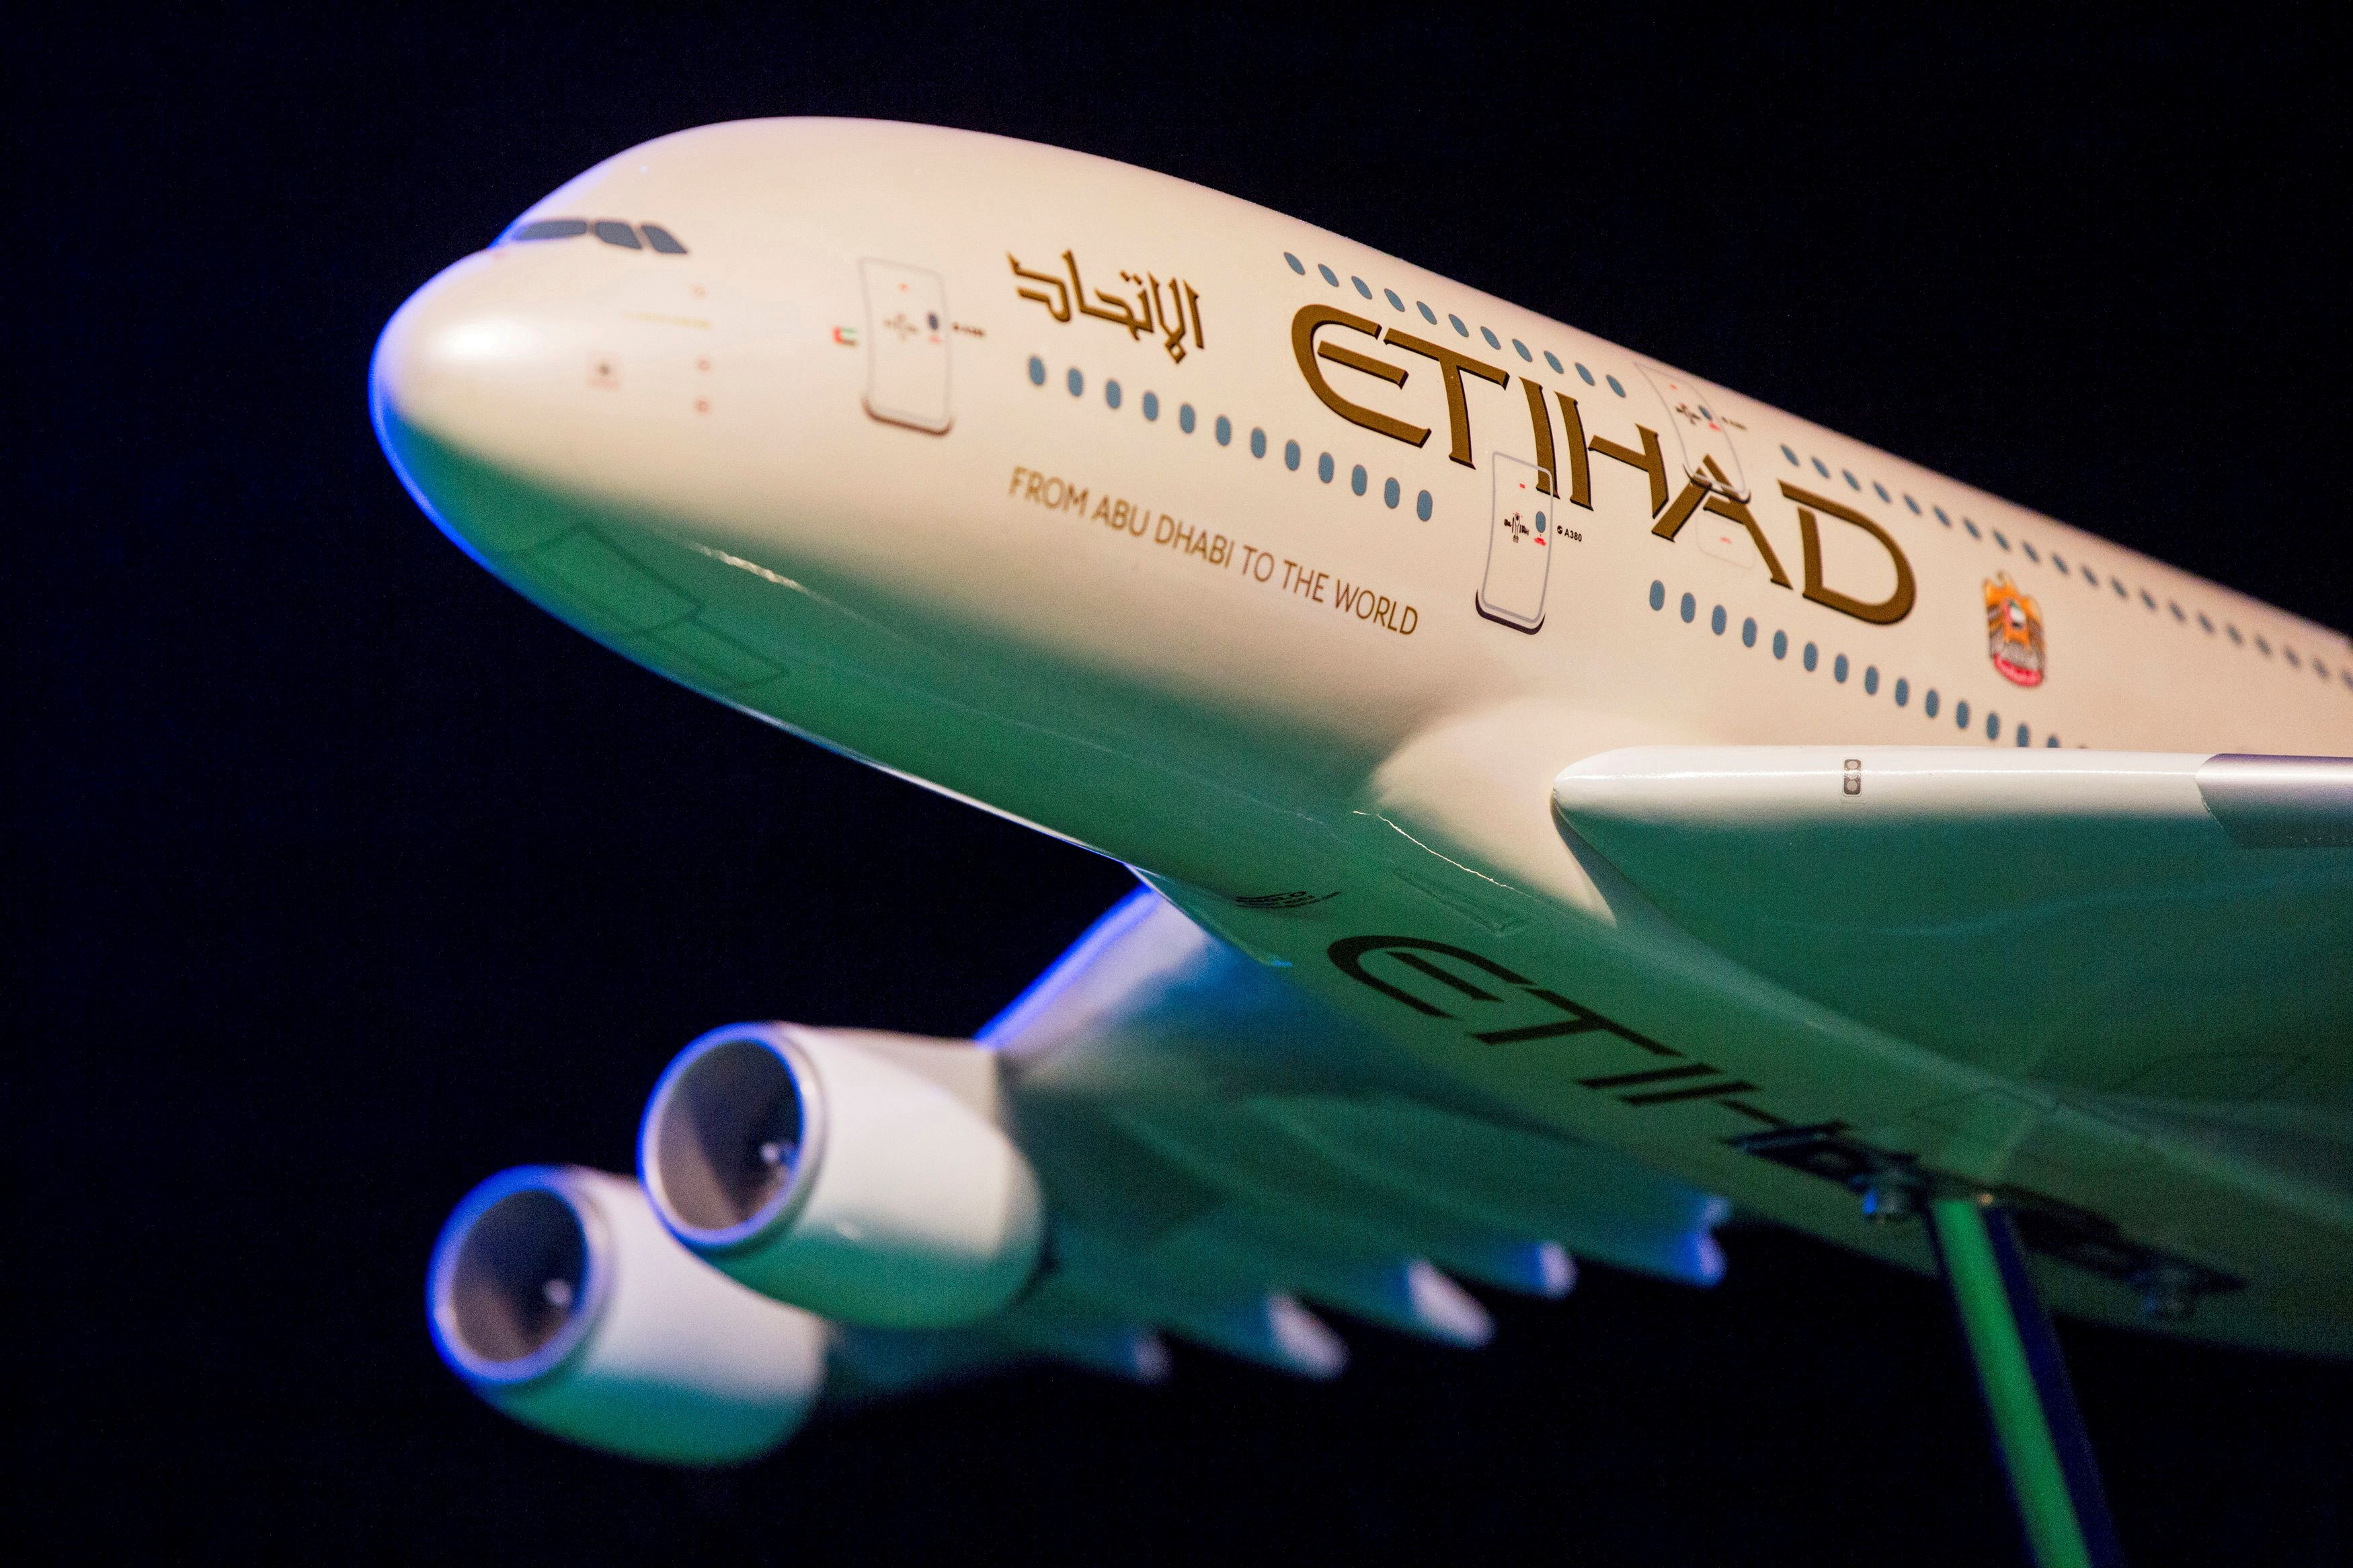 A model Etihad Airways plane is seen on stage in New York, U.S. November 13, 2014.  REUTERS/Lucas Jackson/File Photo